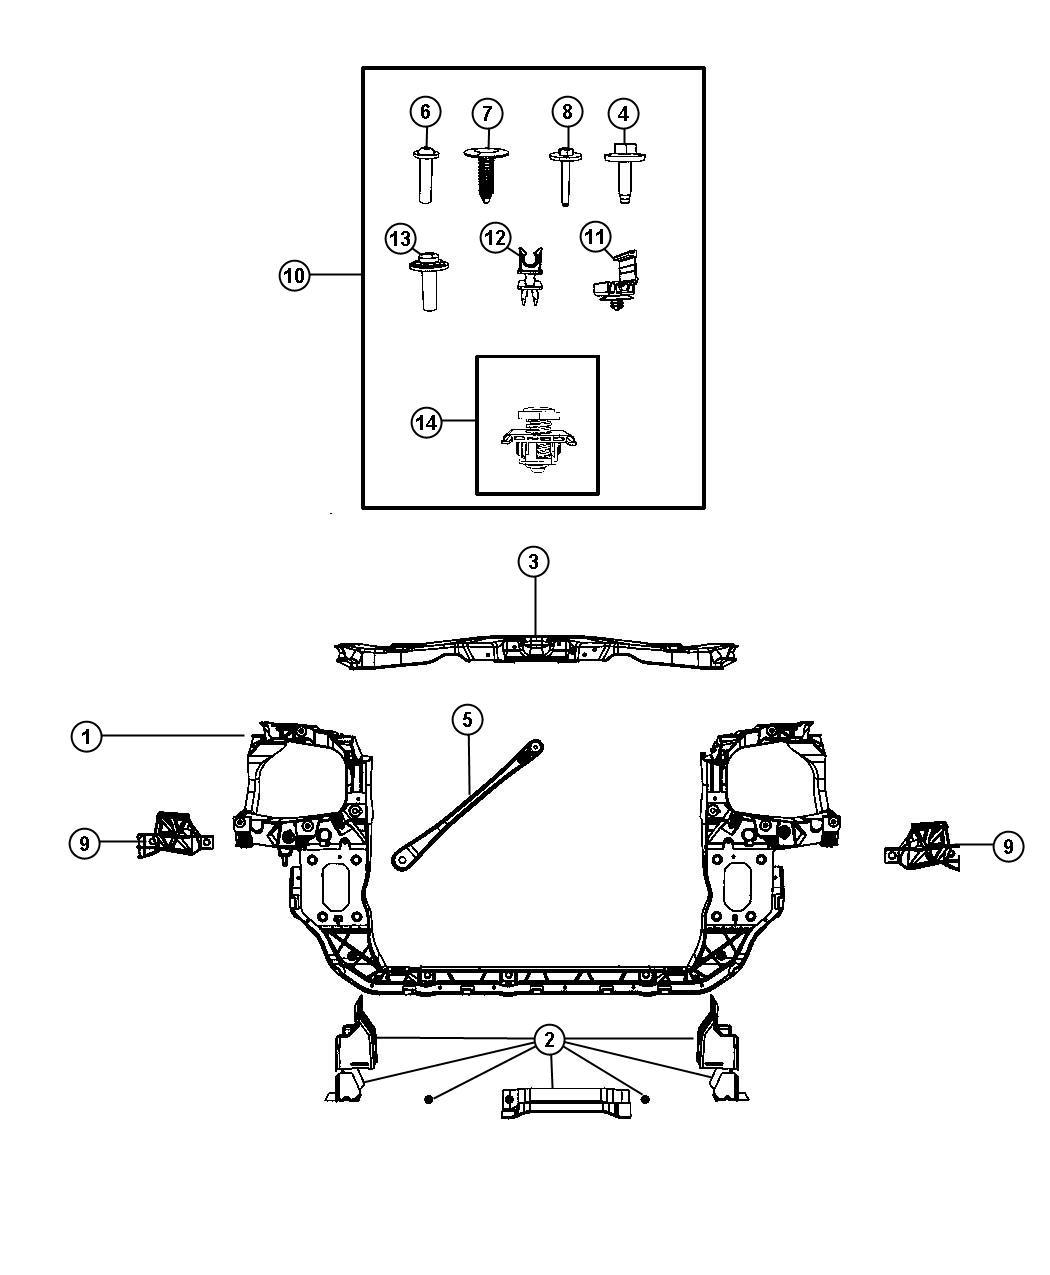 2010 Dodge Caravan Parts Diagram Exterior. Dodge. Auto